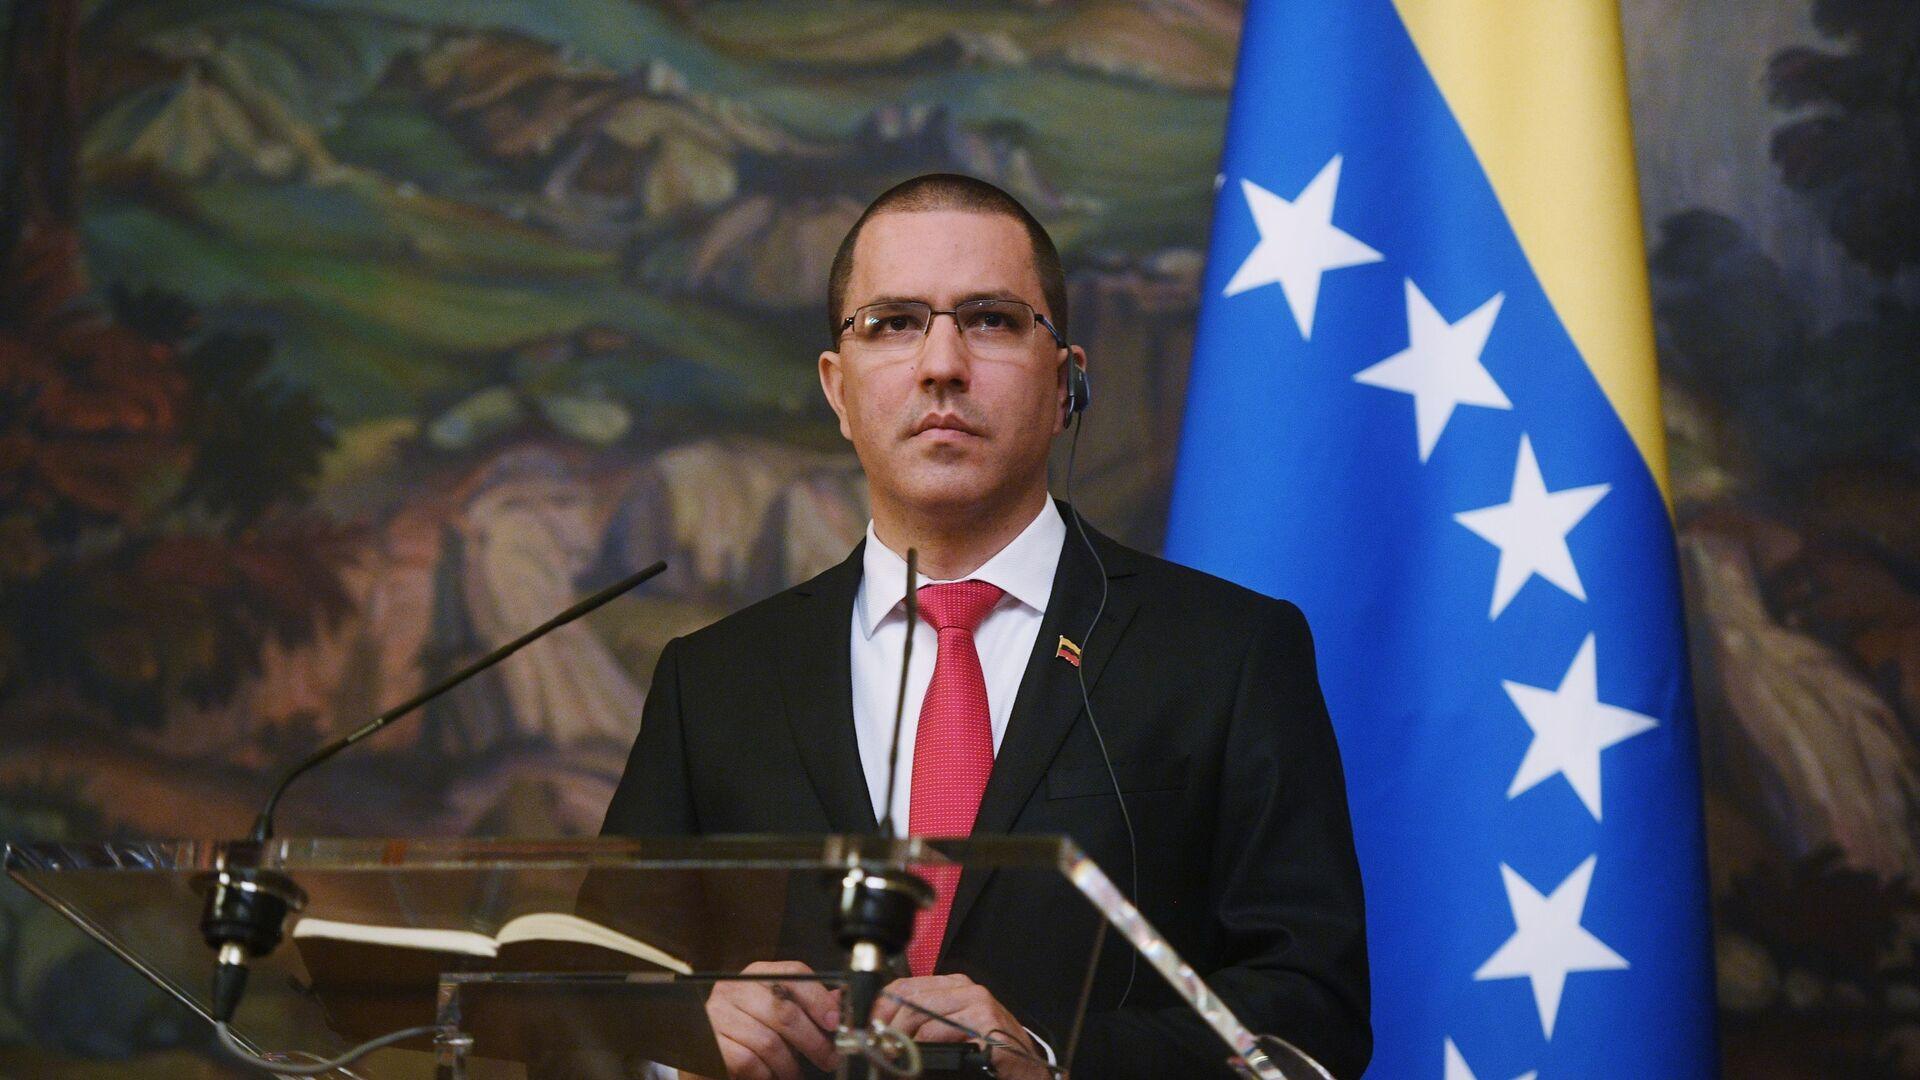 Jorge Arreaza, canciller de Venezuela - Sputnik Mundo, 1920, 03.02.2021